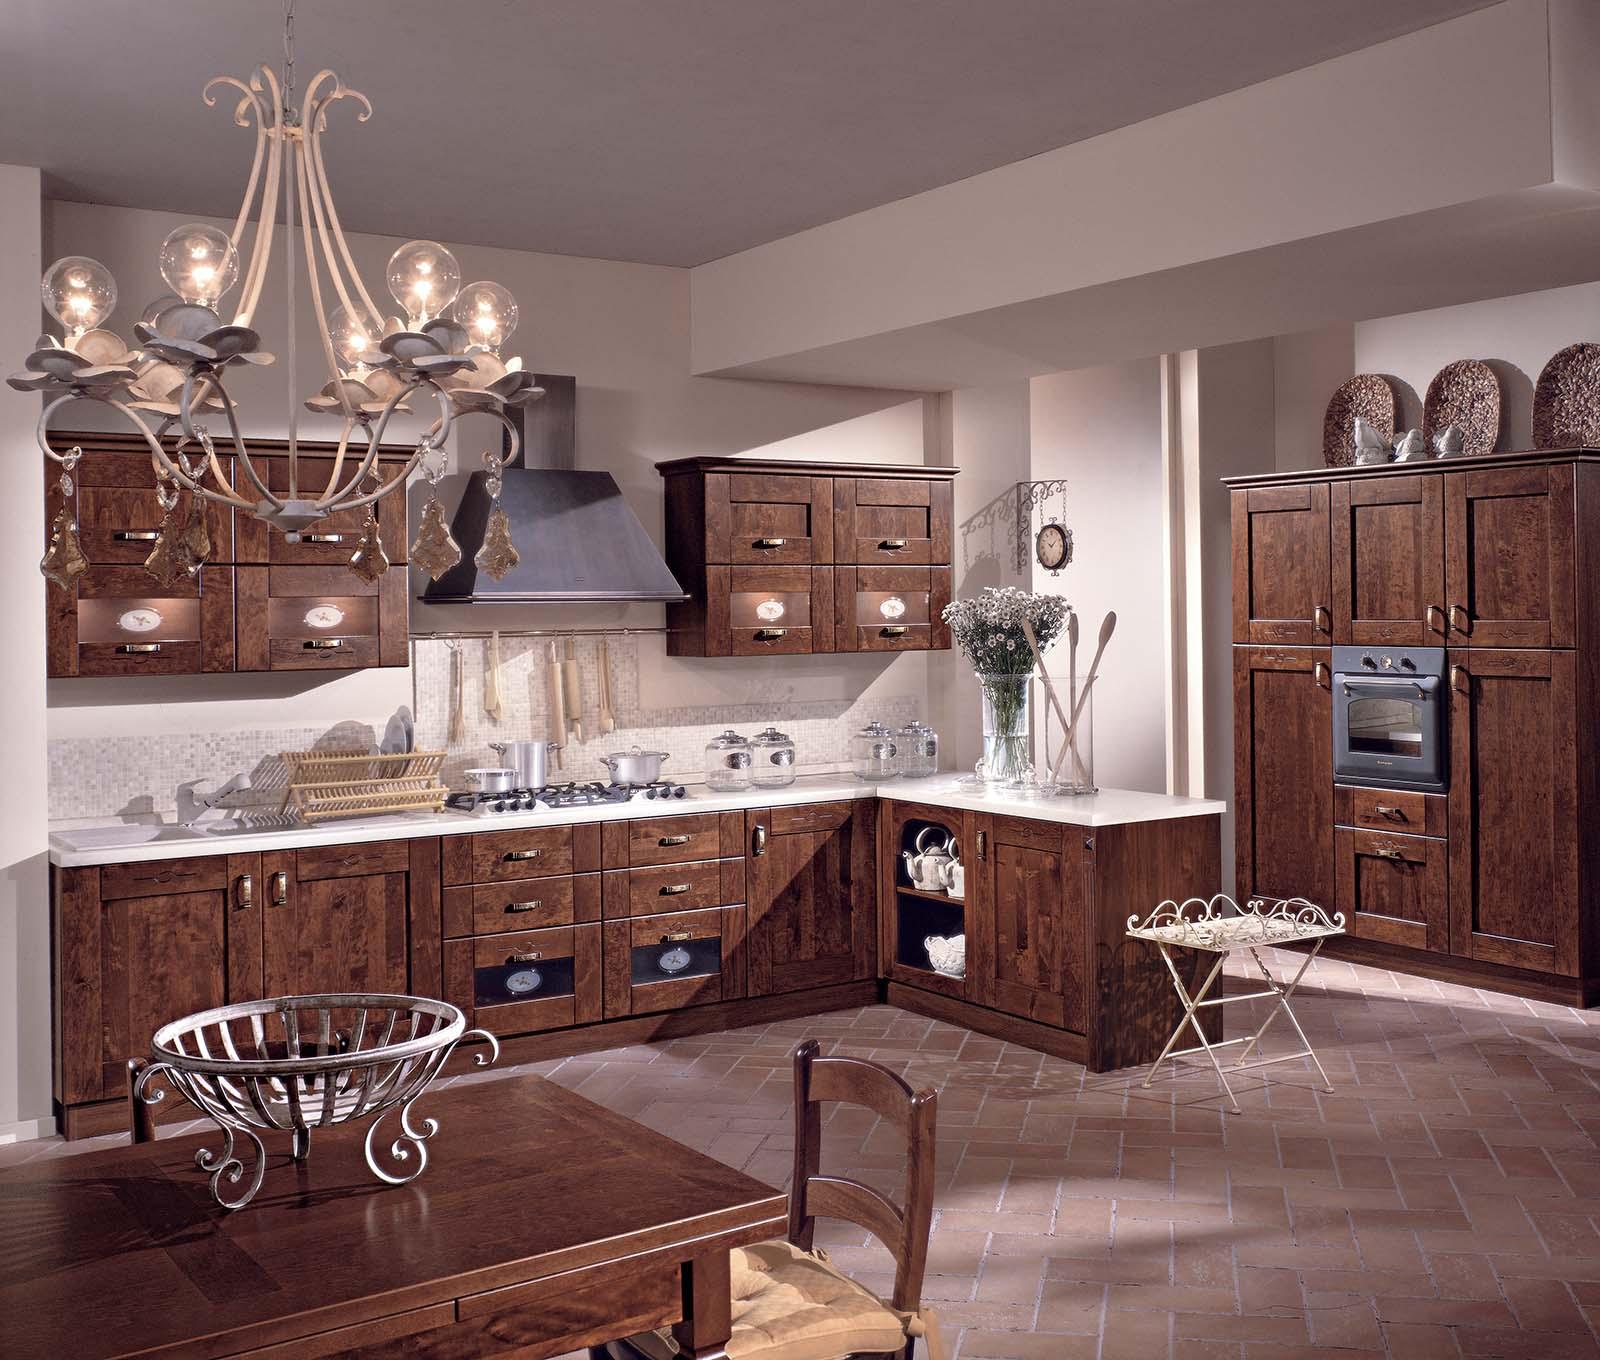 landini cucine cucine artigianali prodotte in toscana